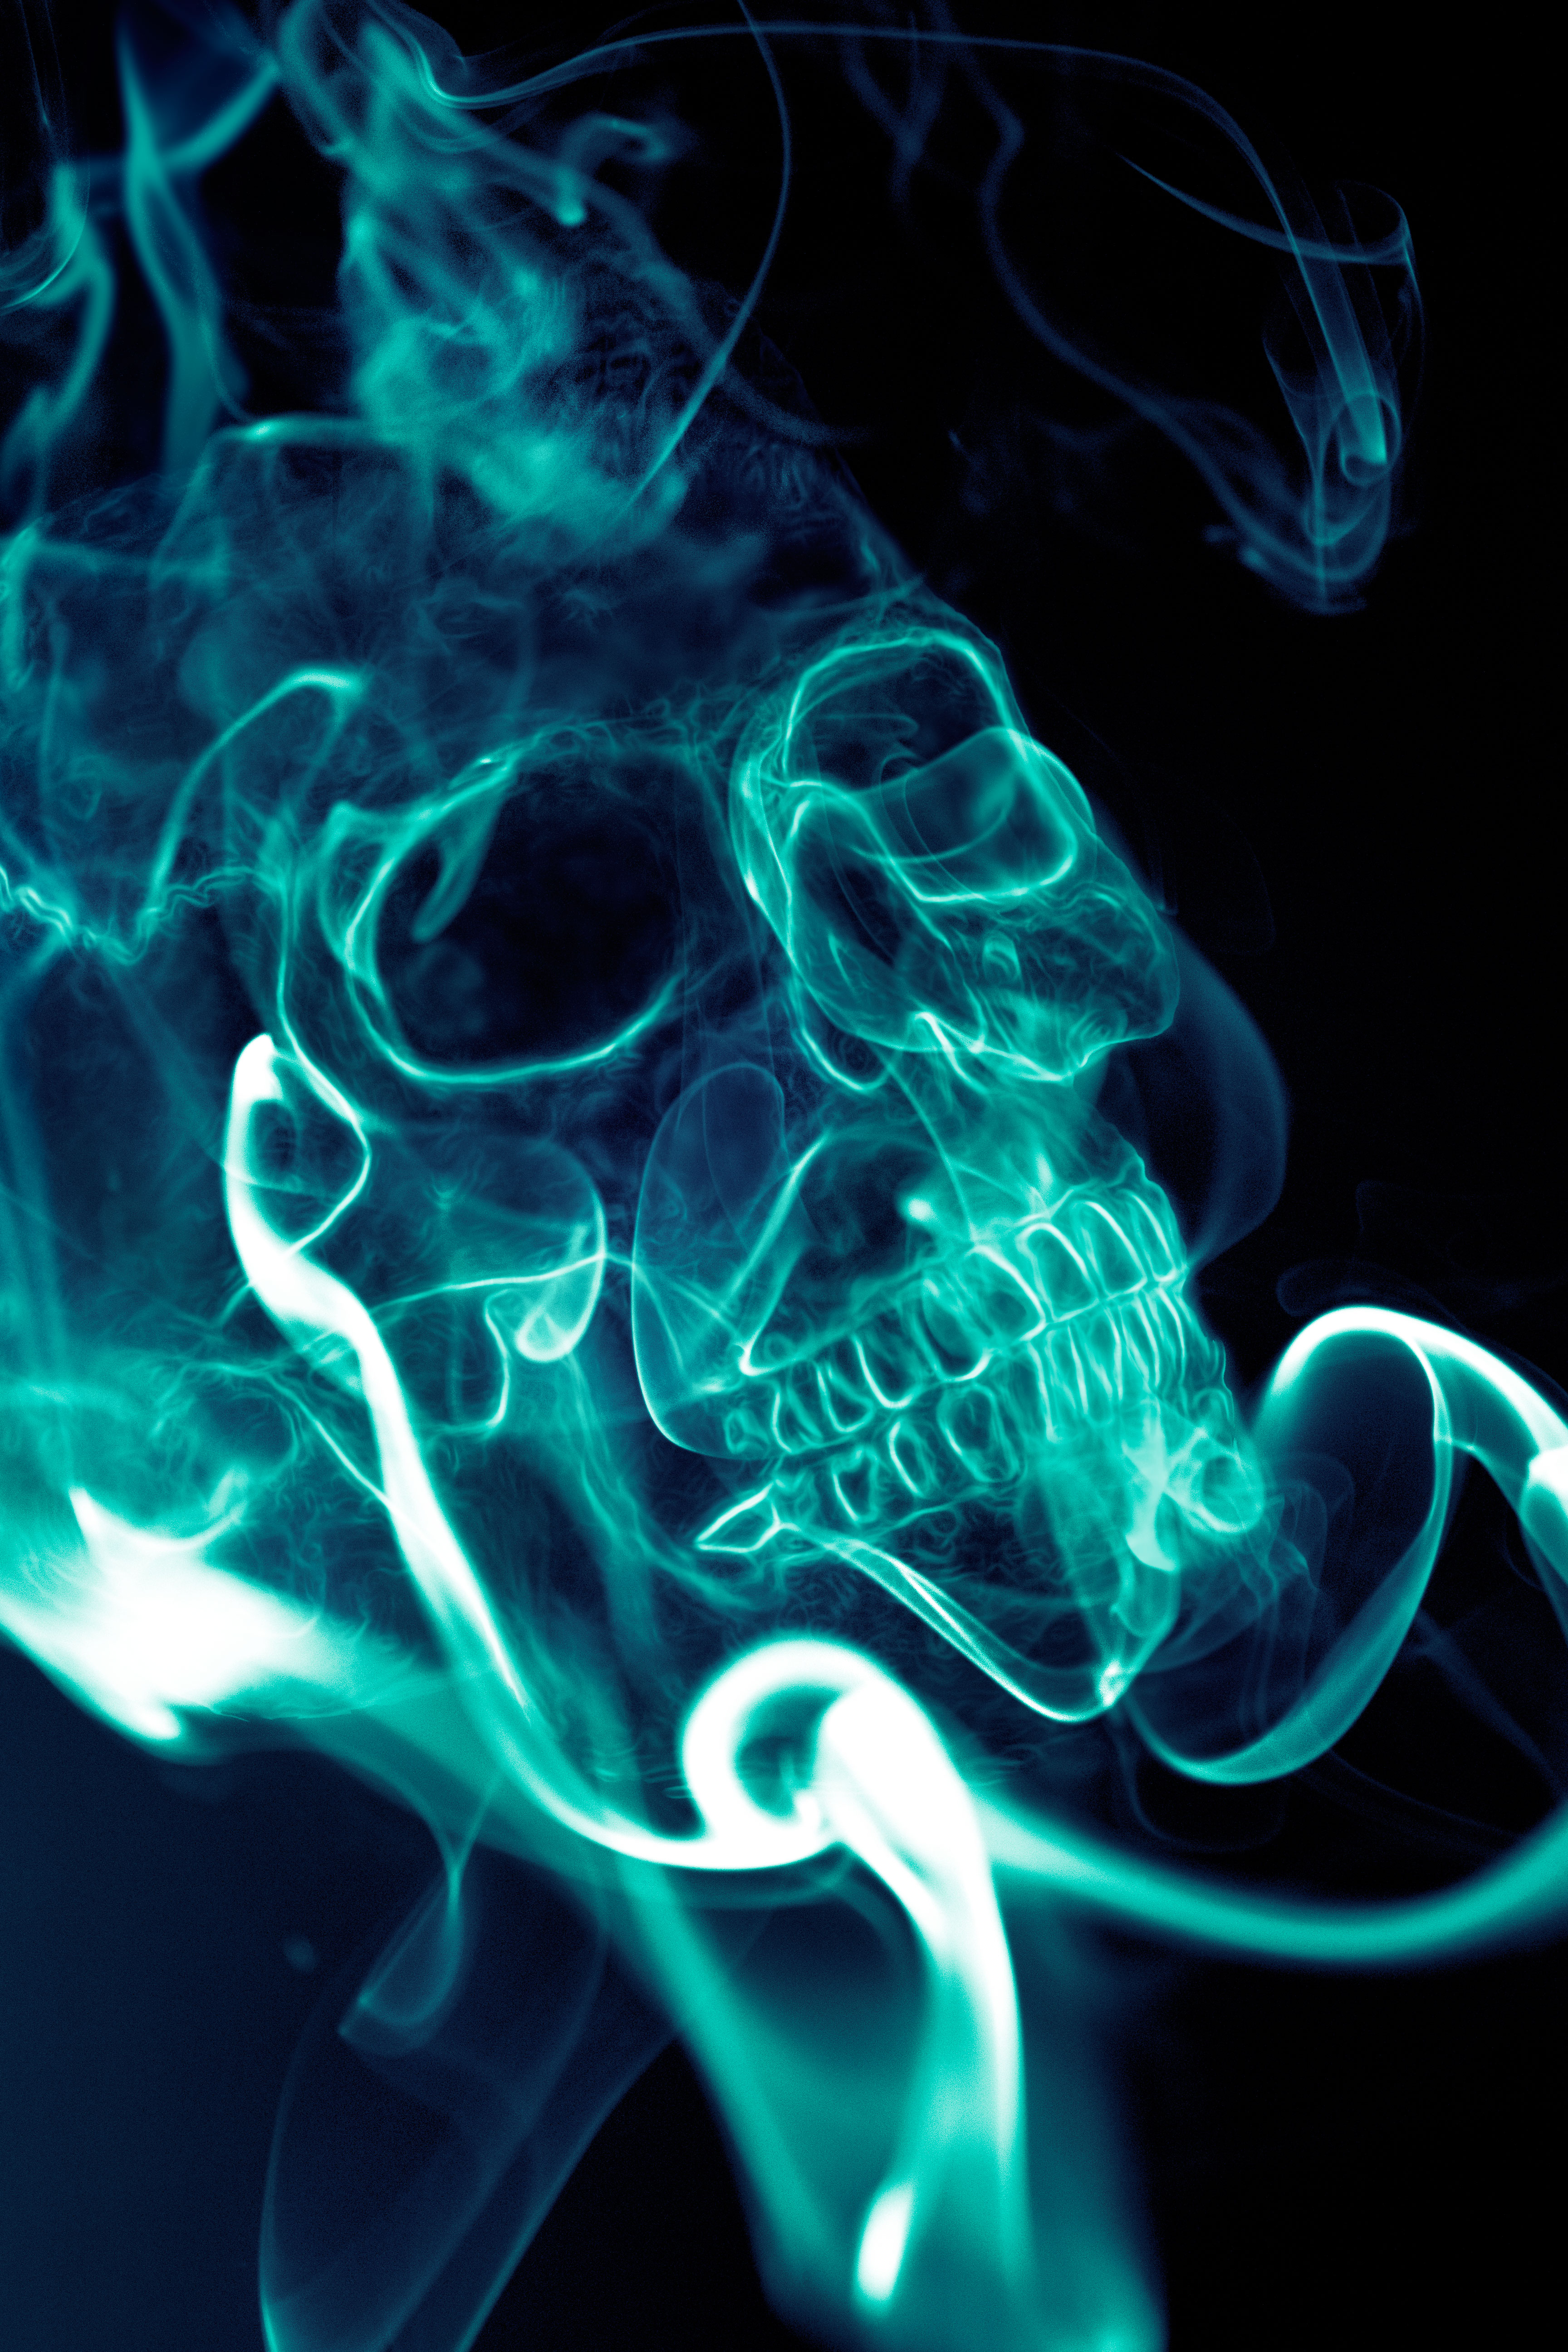 Smoke Skull by juuuso on DeviantArt